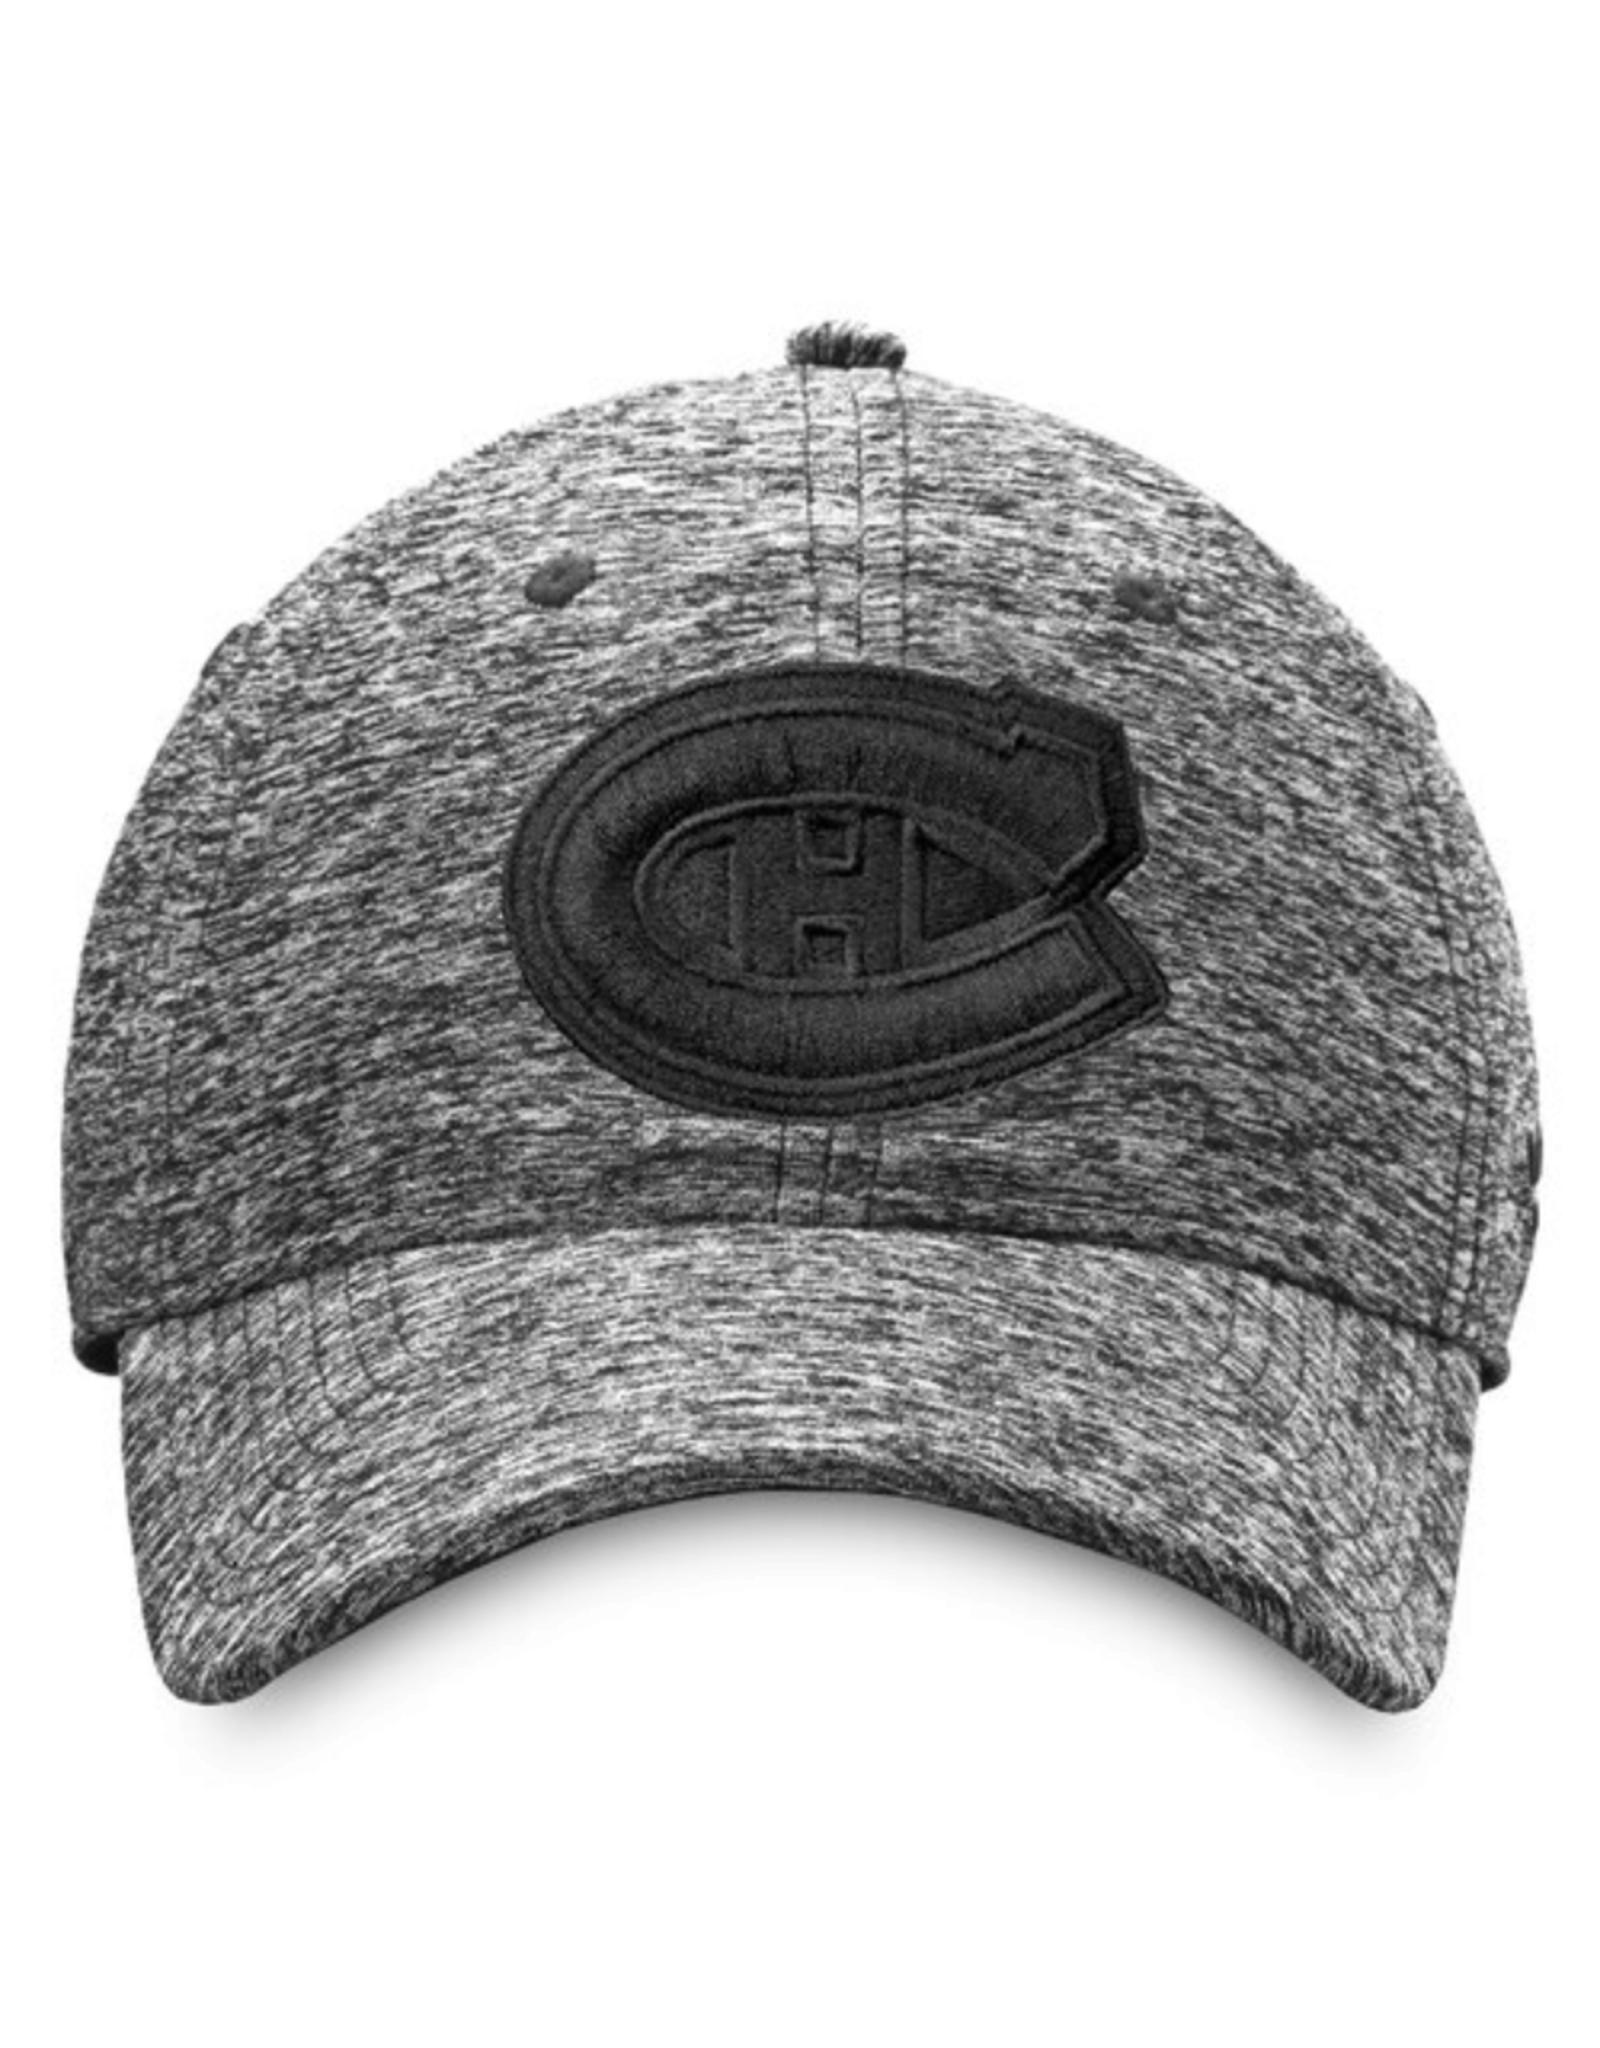 Fanatics Fanatics Men's Black Ice Adjustable Hat Montreal Canadiens Black